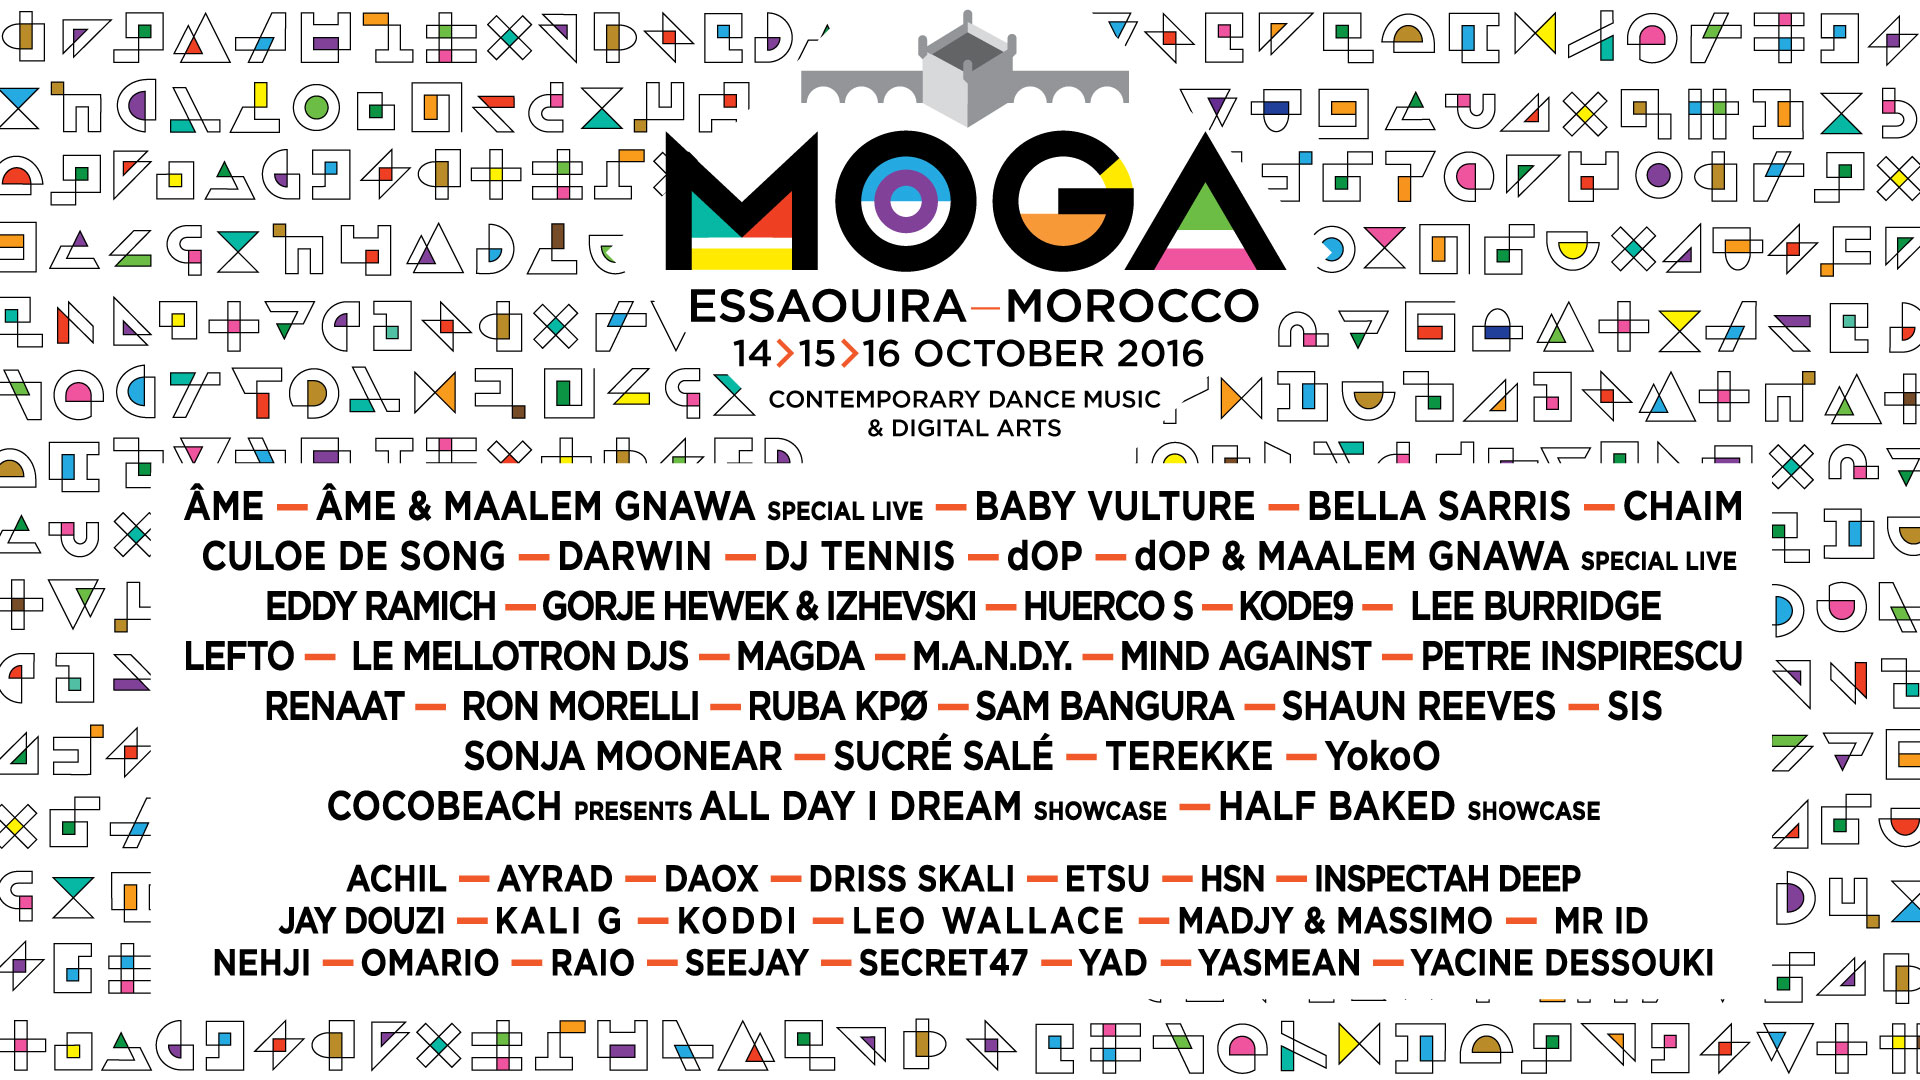 moga16-couv-event-20160912